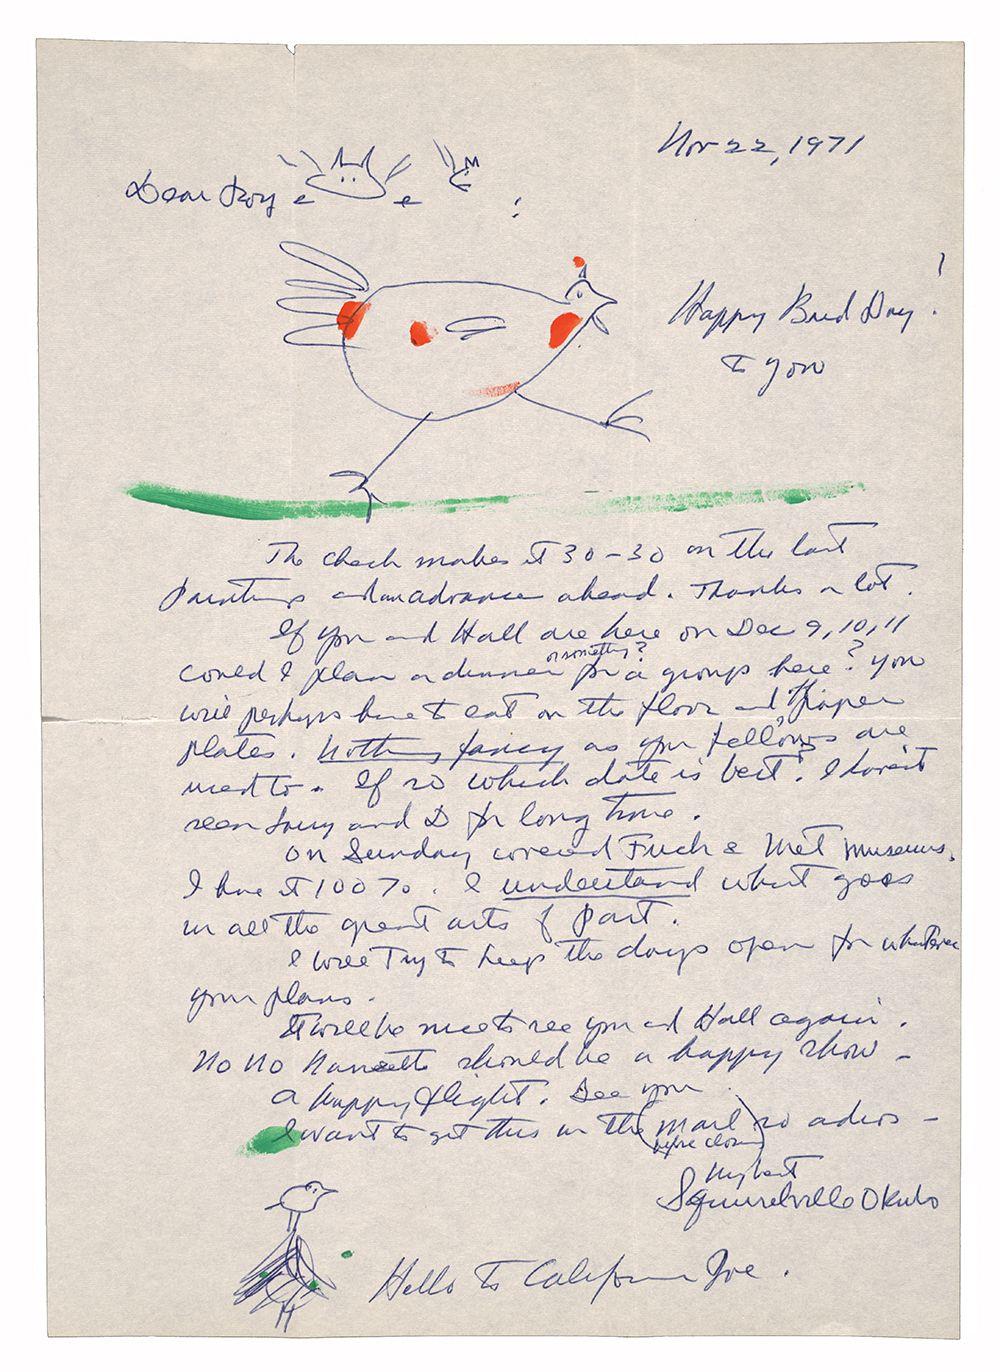 Illustrated letter sent to Roy Leeper by Mine Okubo on November 22, 1971